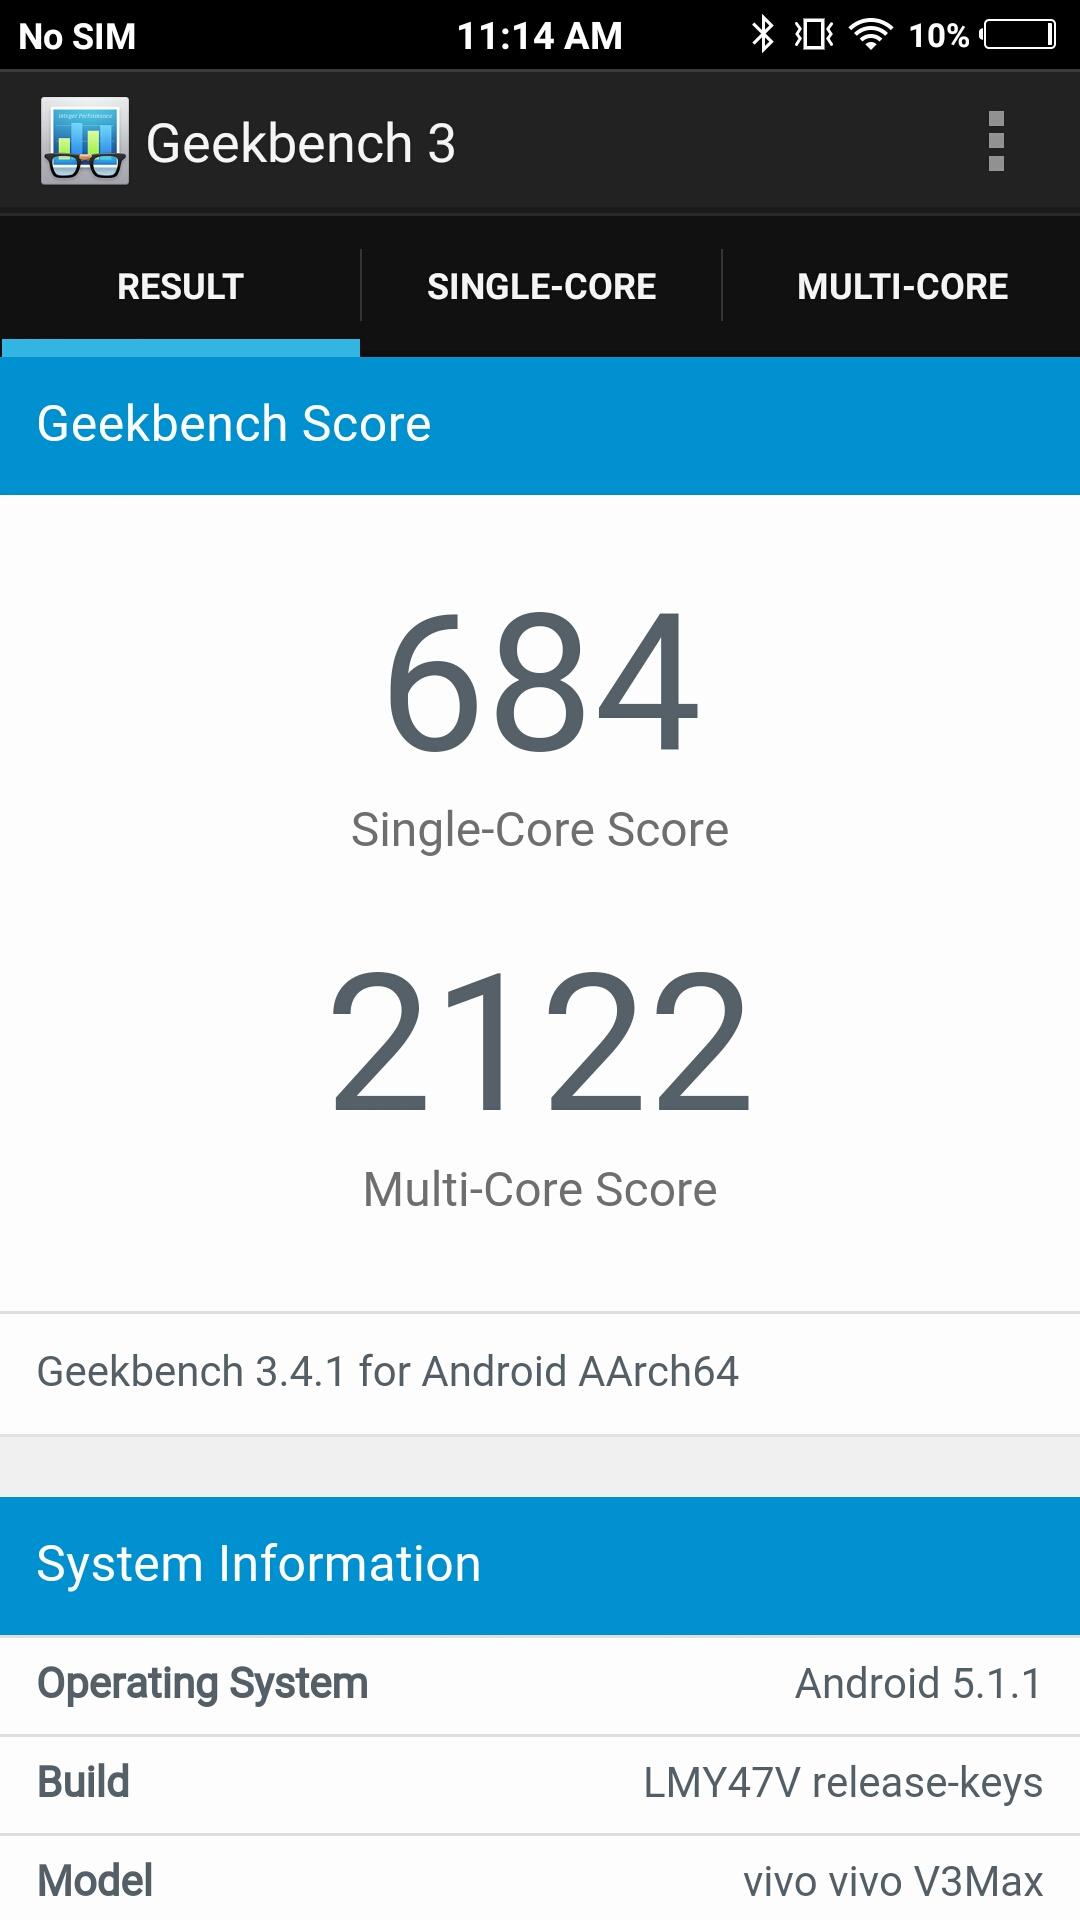 Vivo v3 Max GeekBench Benchmark Score Image